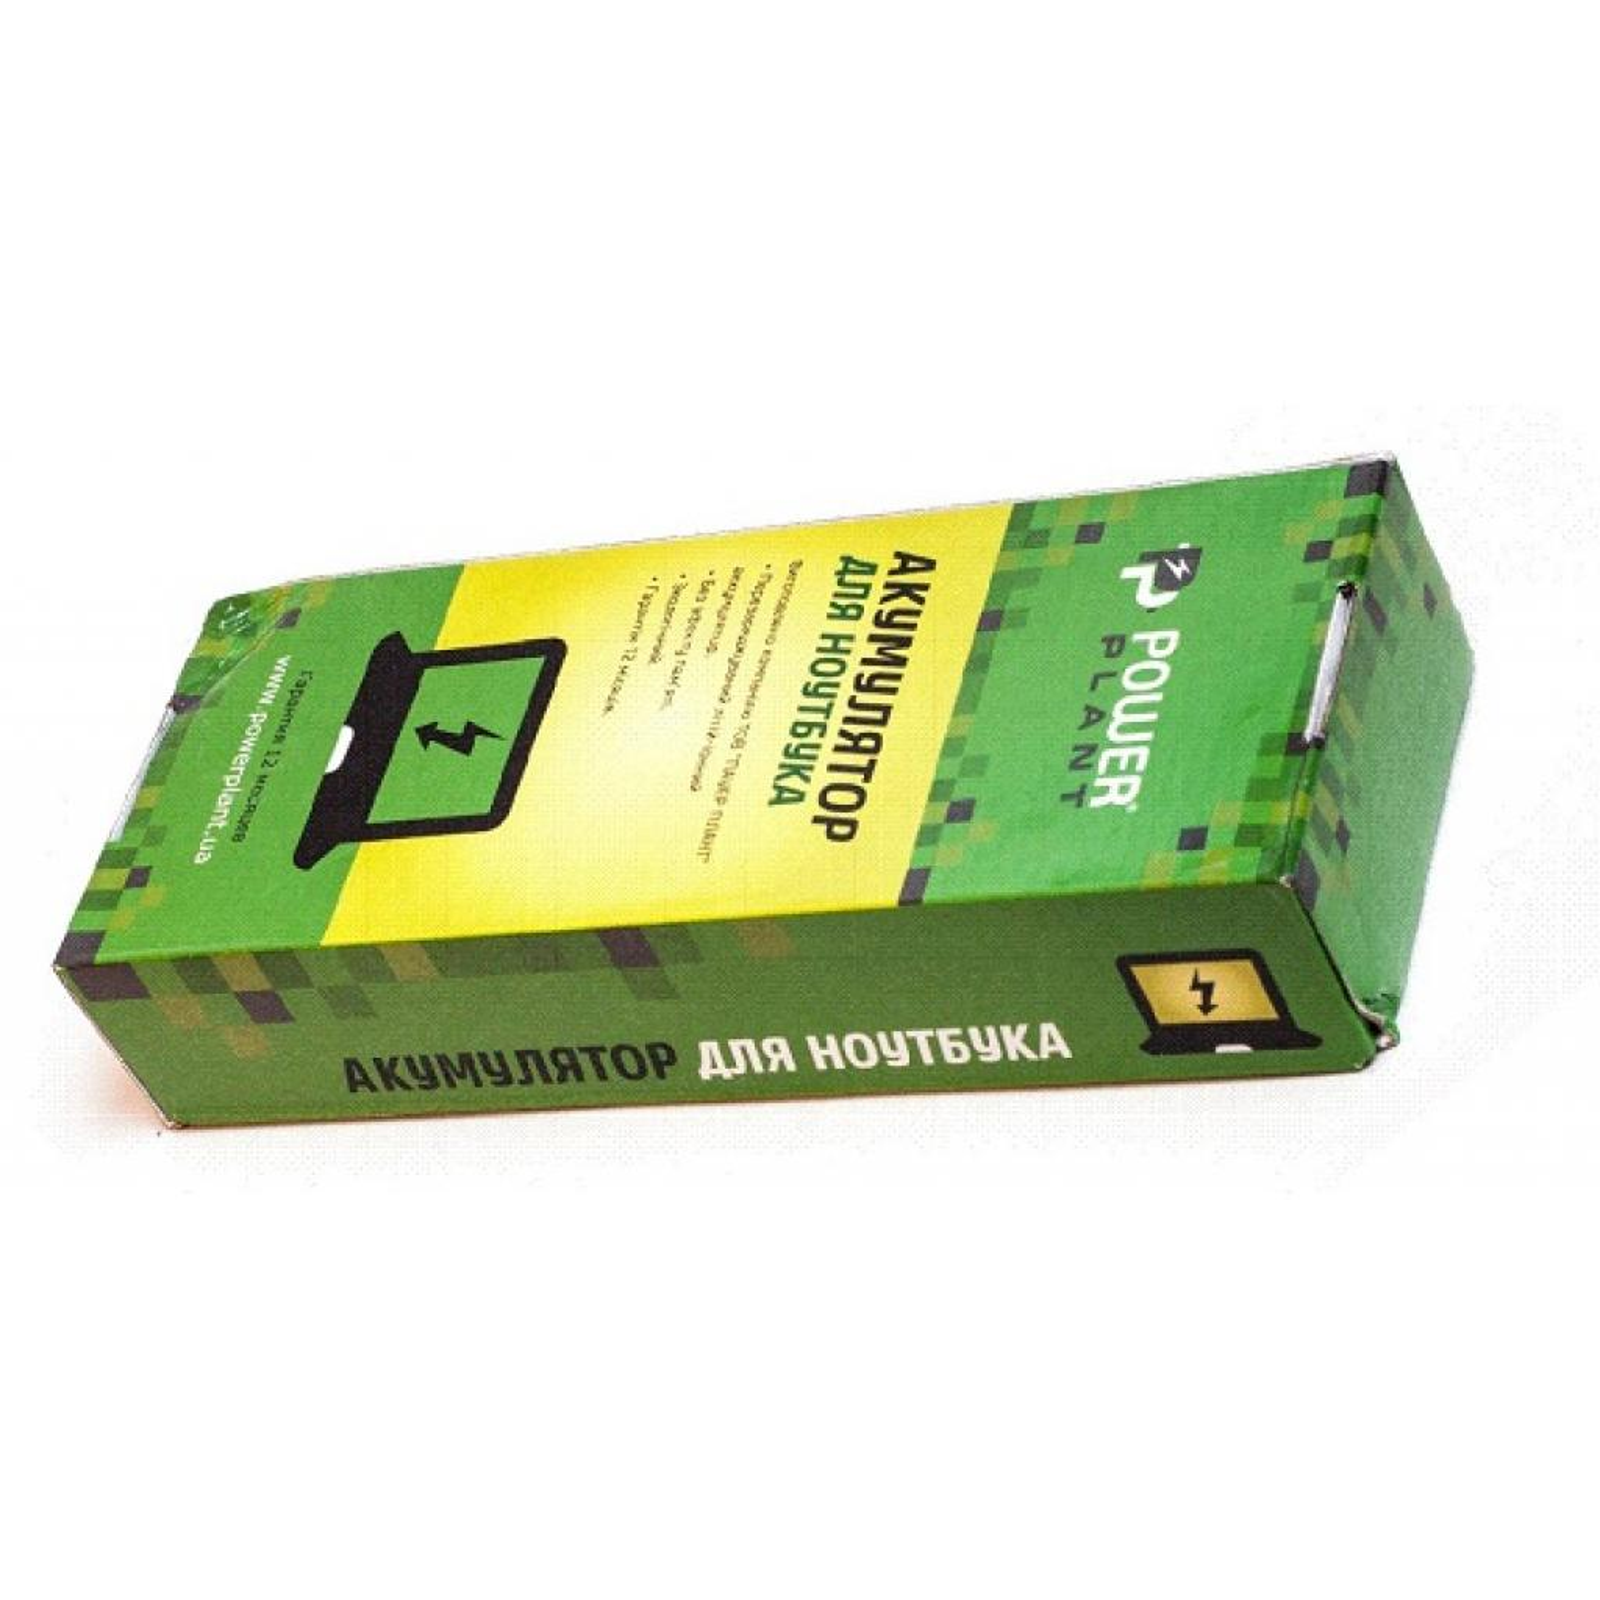 Аккумулятор для ноутбука ACER SMARTSTEP 200n (BTP-44A3 AC-44A3-8) 14.8V 4400mAh PowerPlant (NB00000166) изображение 3